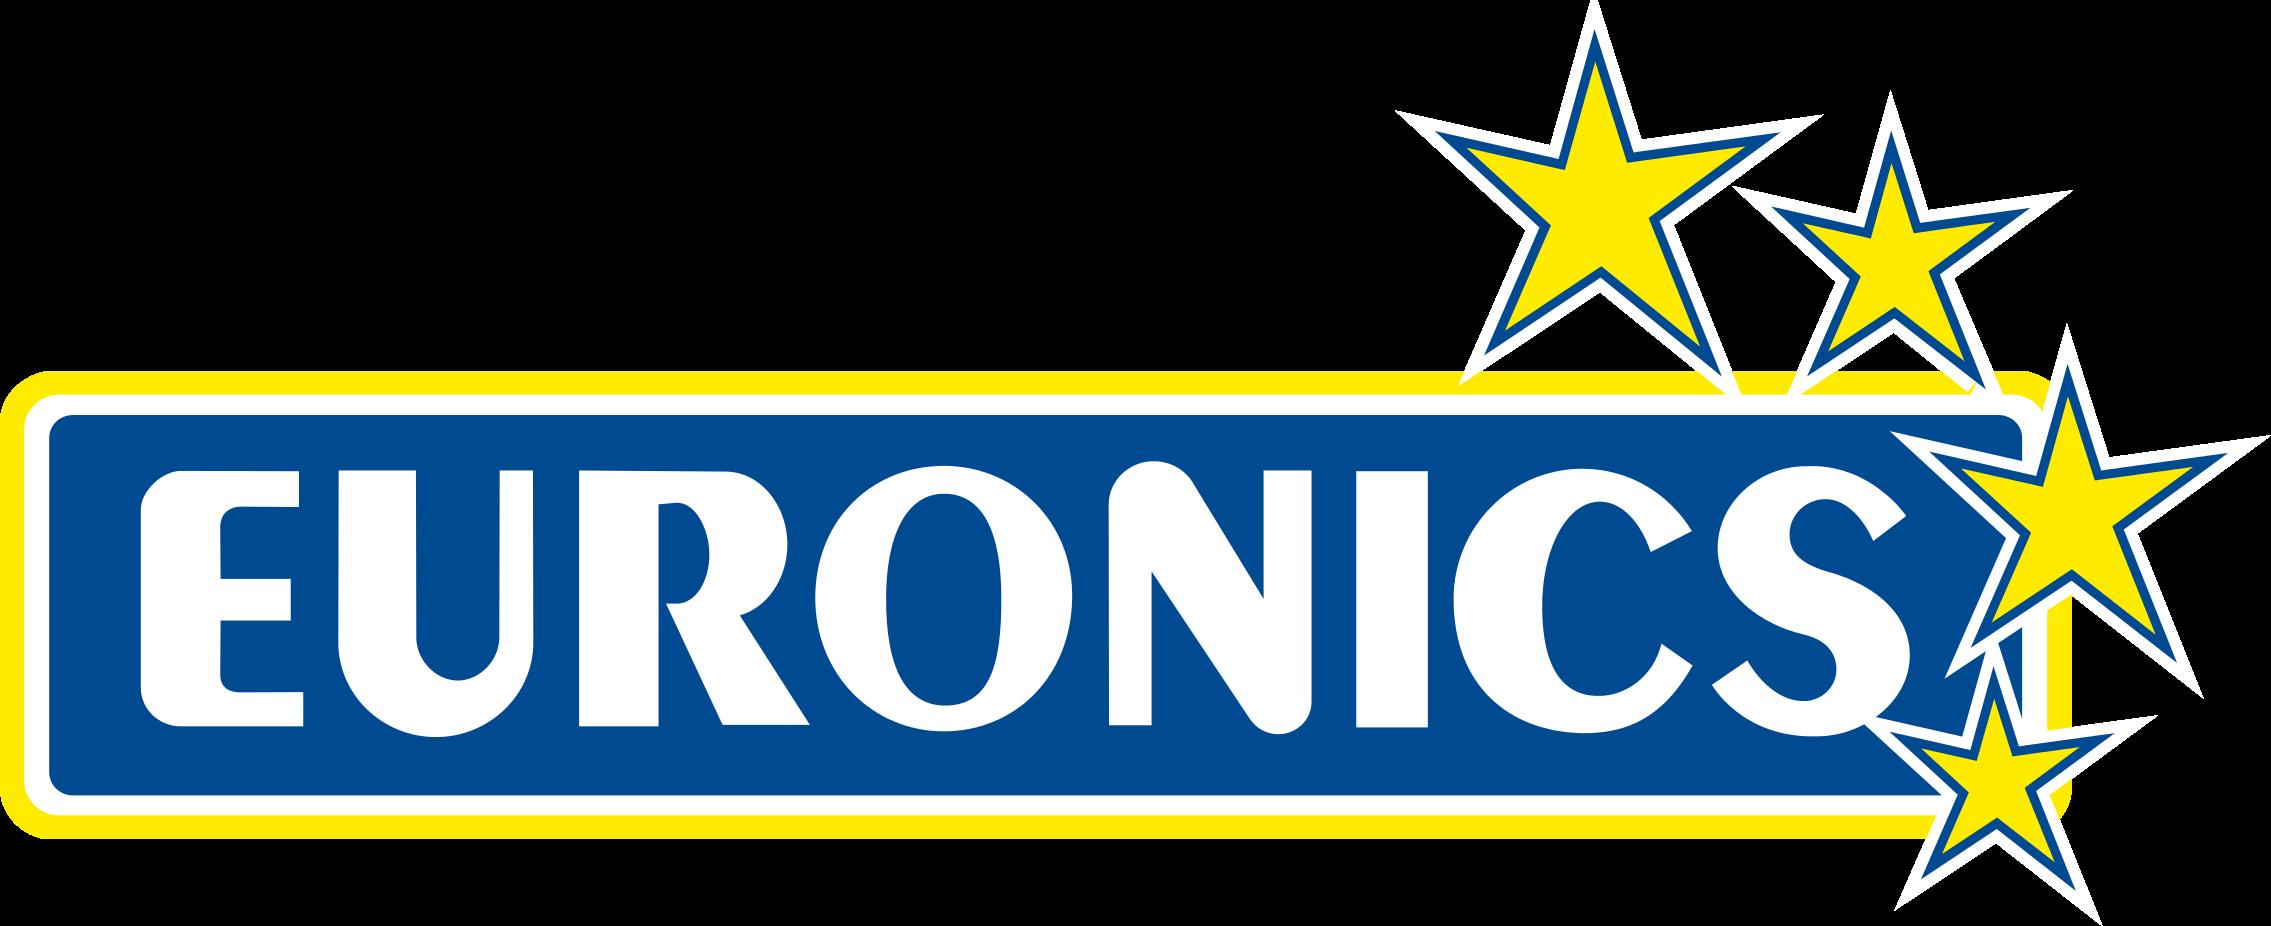 BRITA online retailer Euronics